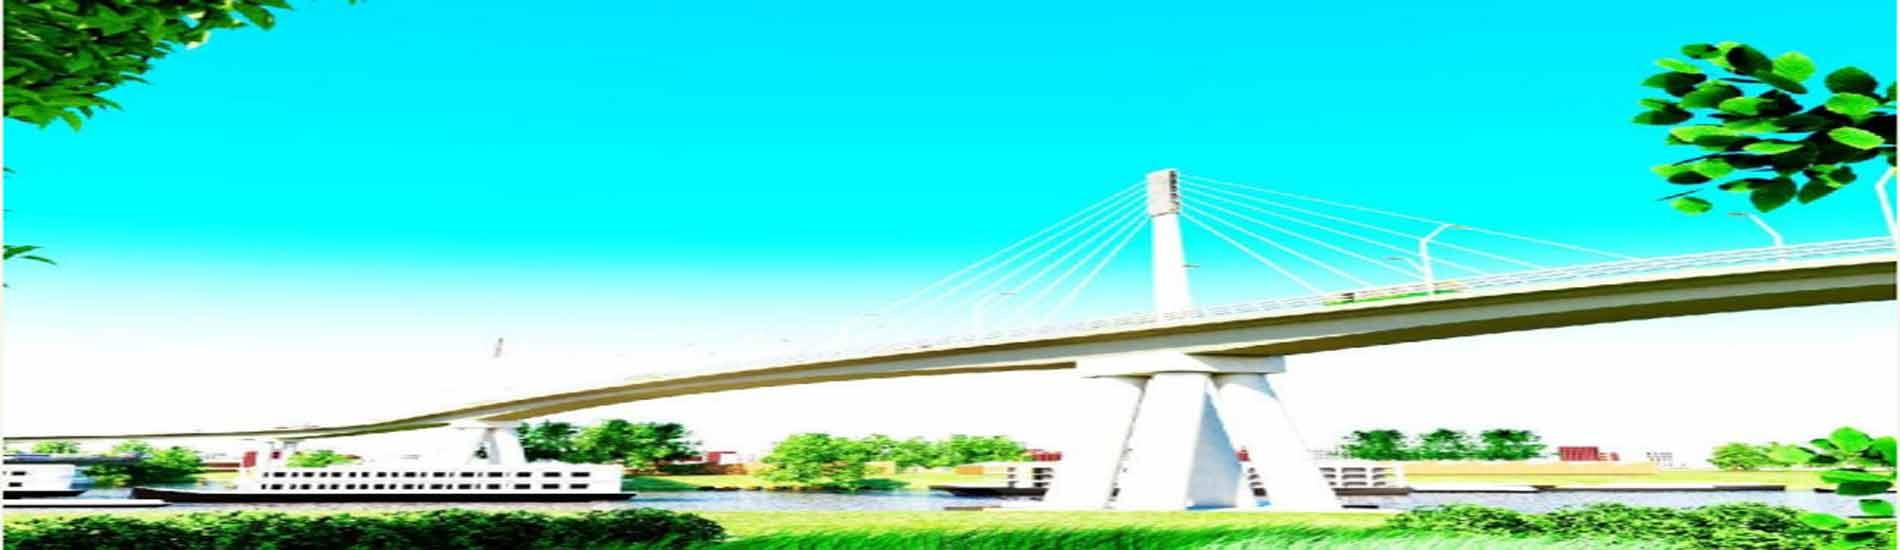 1. Shitolokkha Bridge